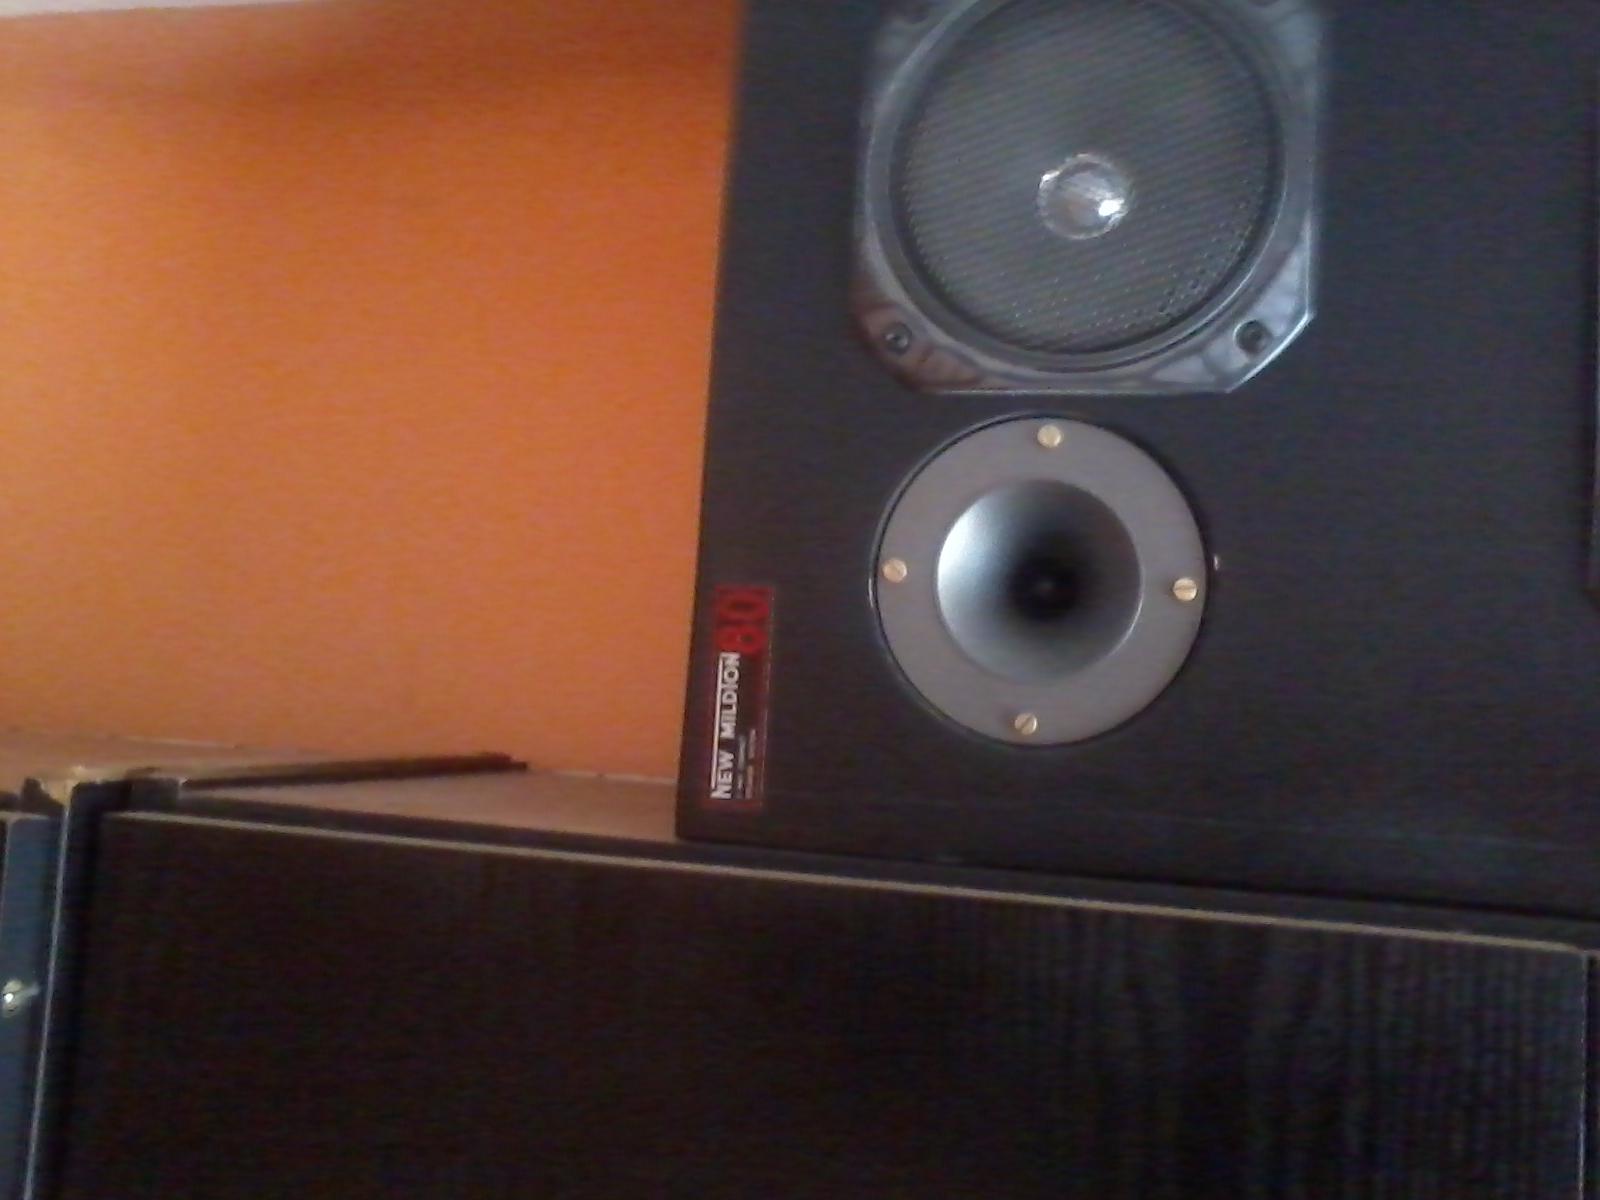 Tonsil ZGN 120 - 8 - 513 i radmor 5102+gramofon tsuba pl 731 czyli Bernard